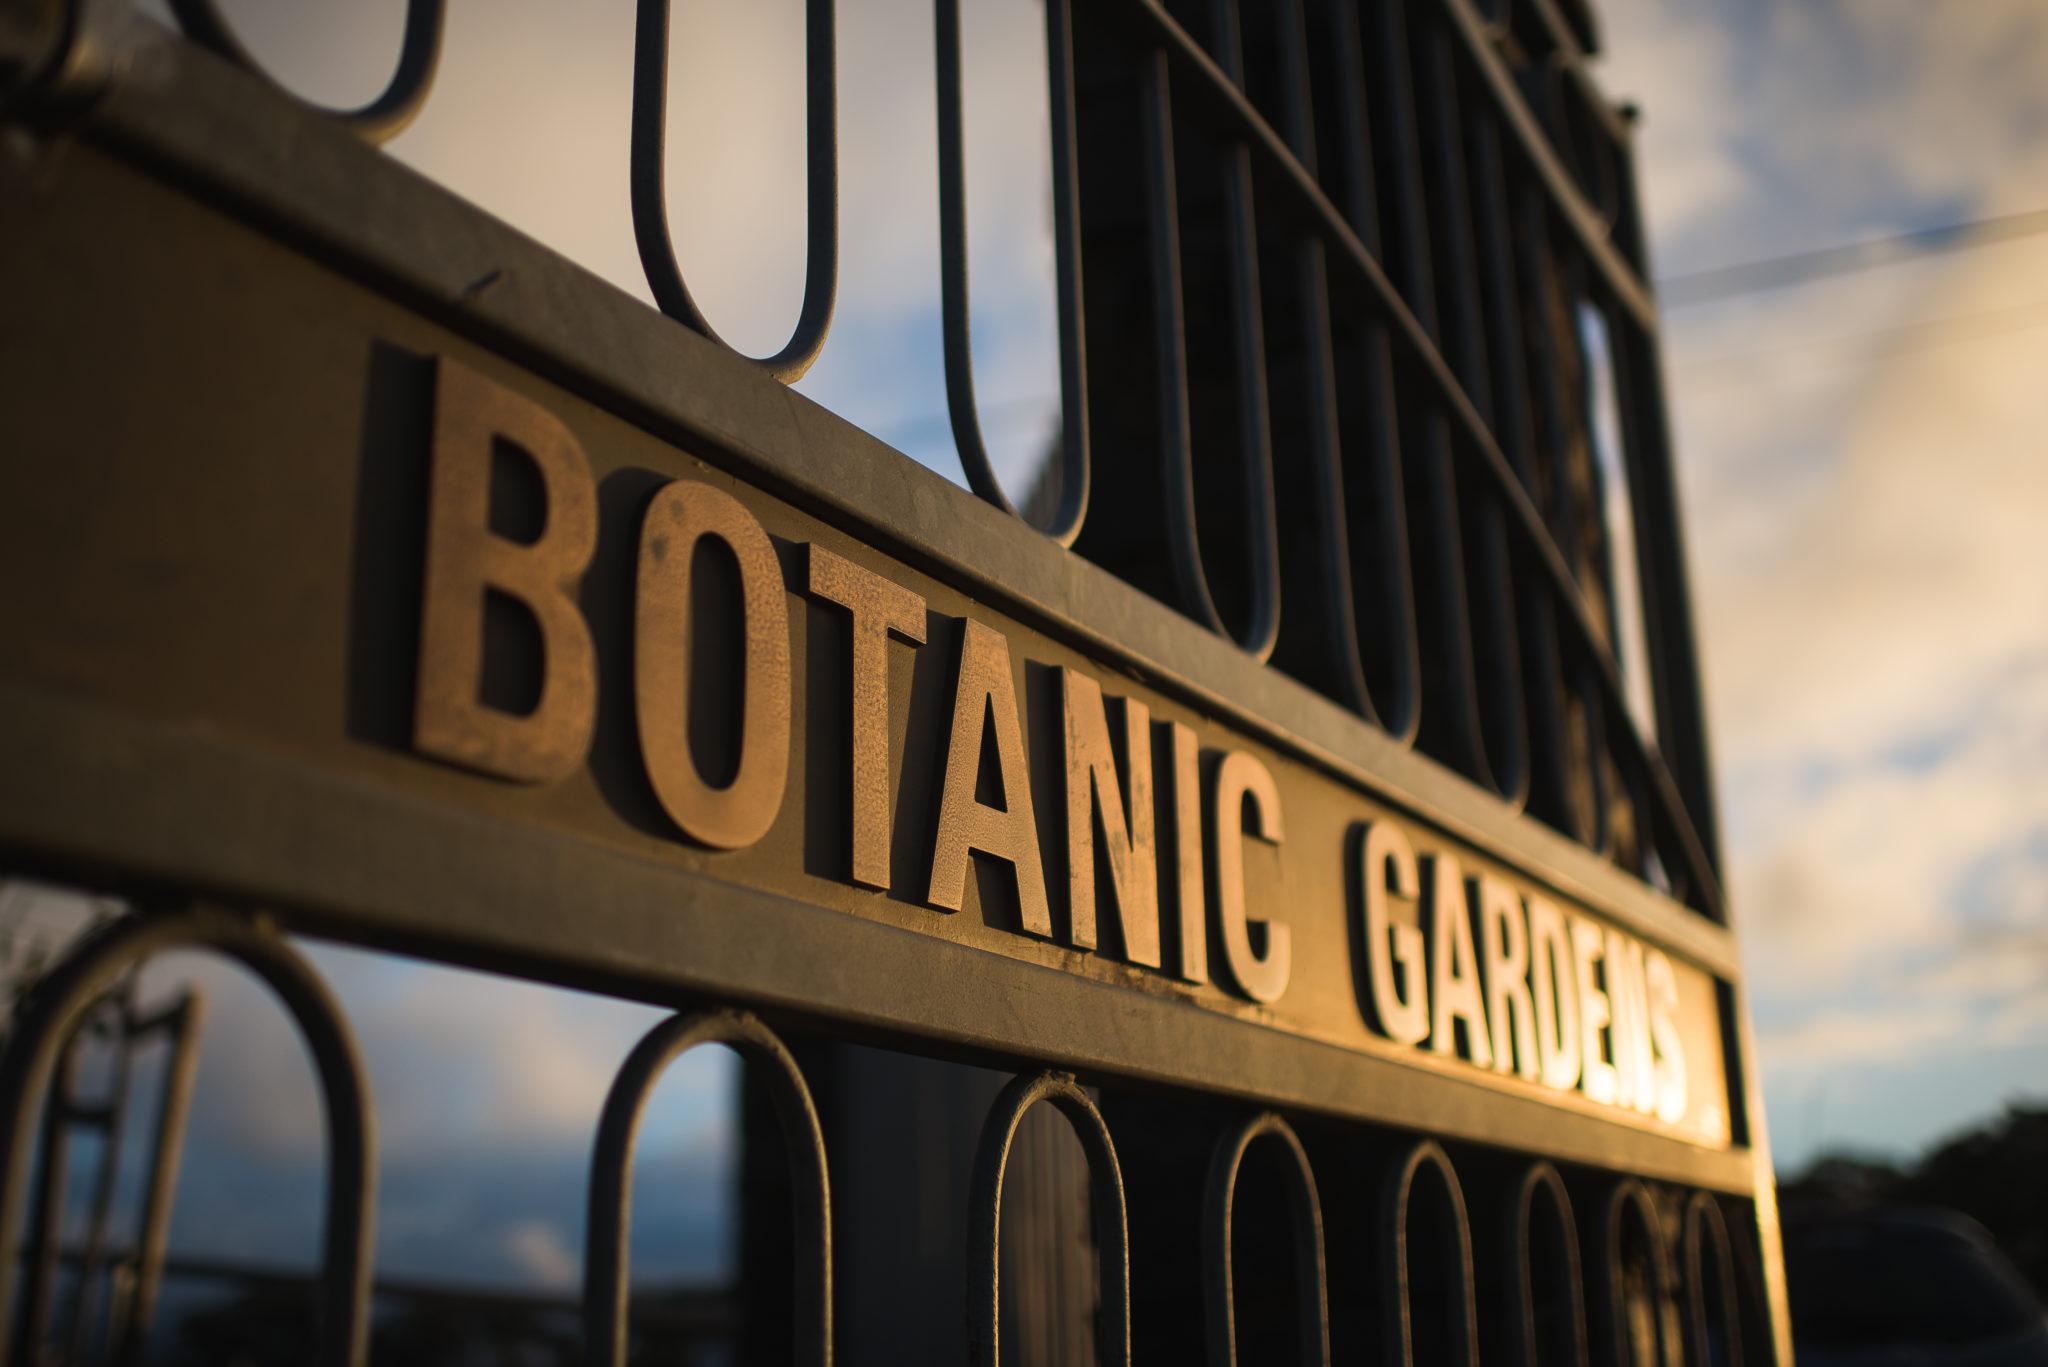 Image of the gate at Orange Botanical gardens at sunset